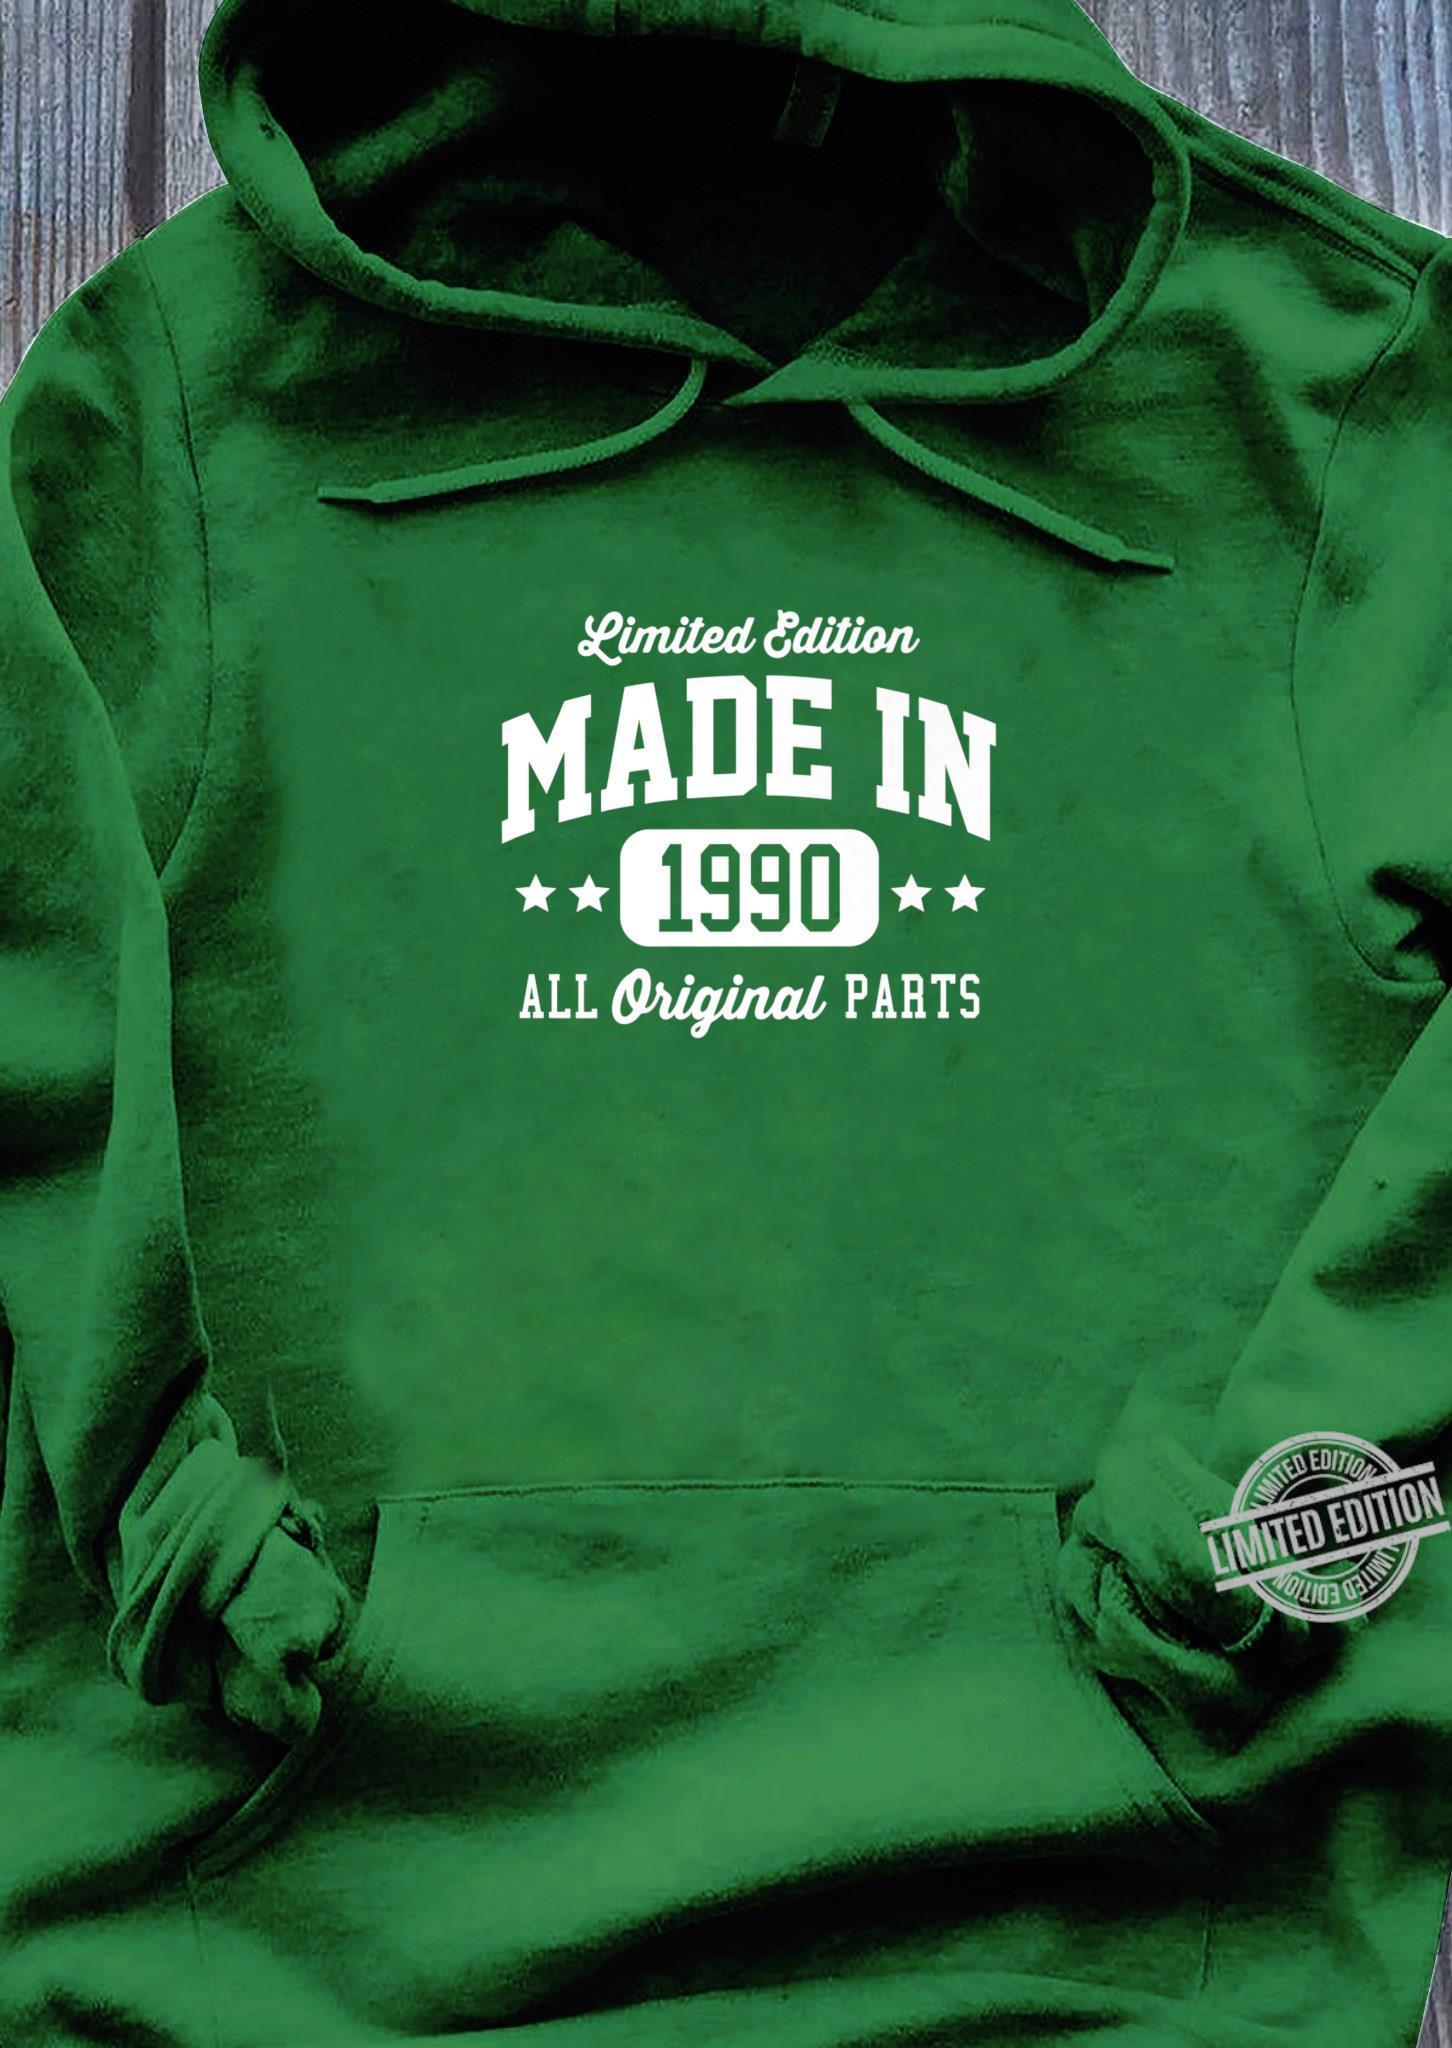 Vintage Made In 1990 Limited Edition Original Parts Dark Shirt hoodie